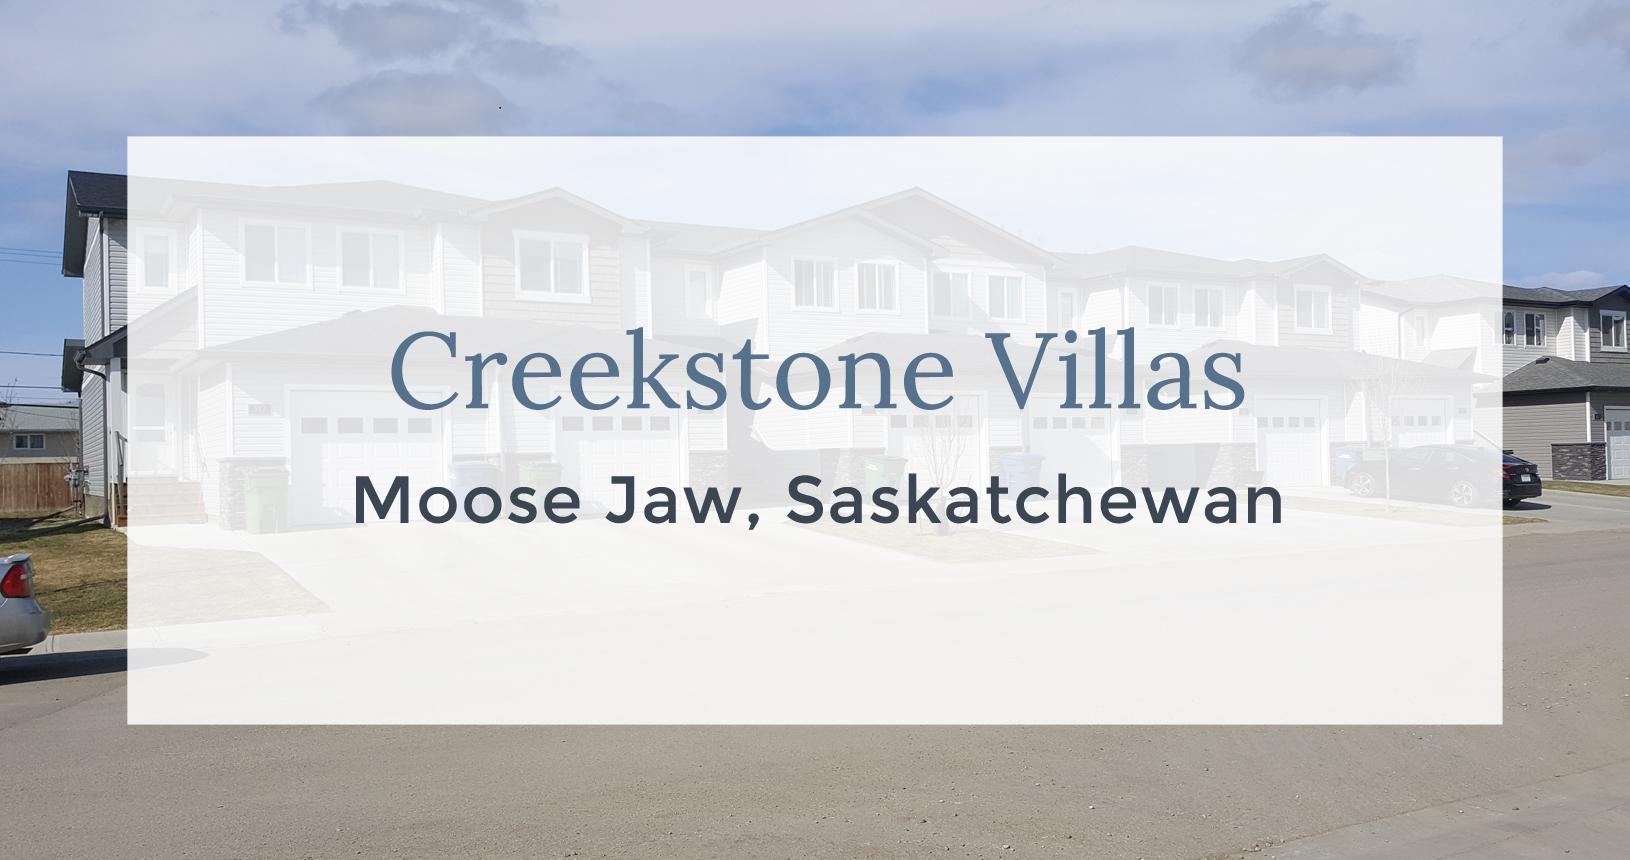 Creekstone Villas: Moose Jaw, Saskatchewan